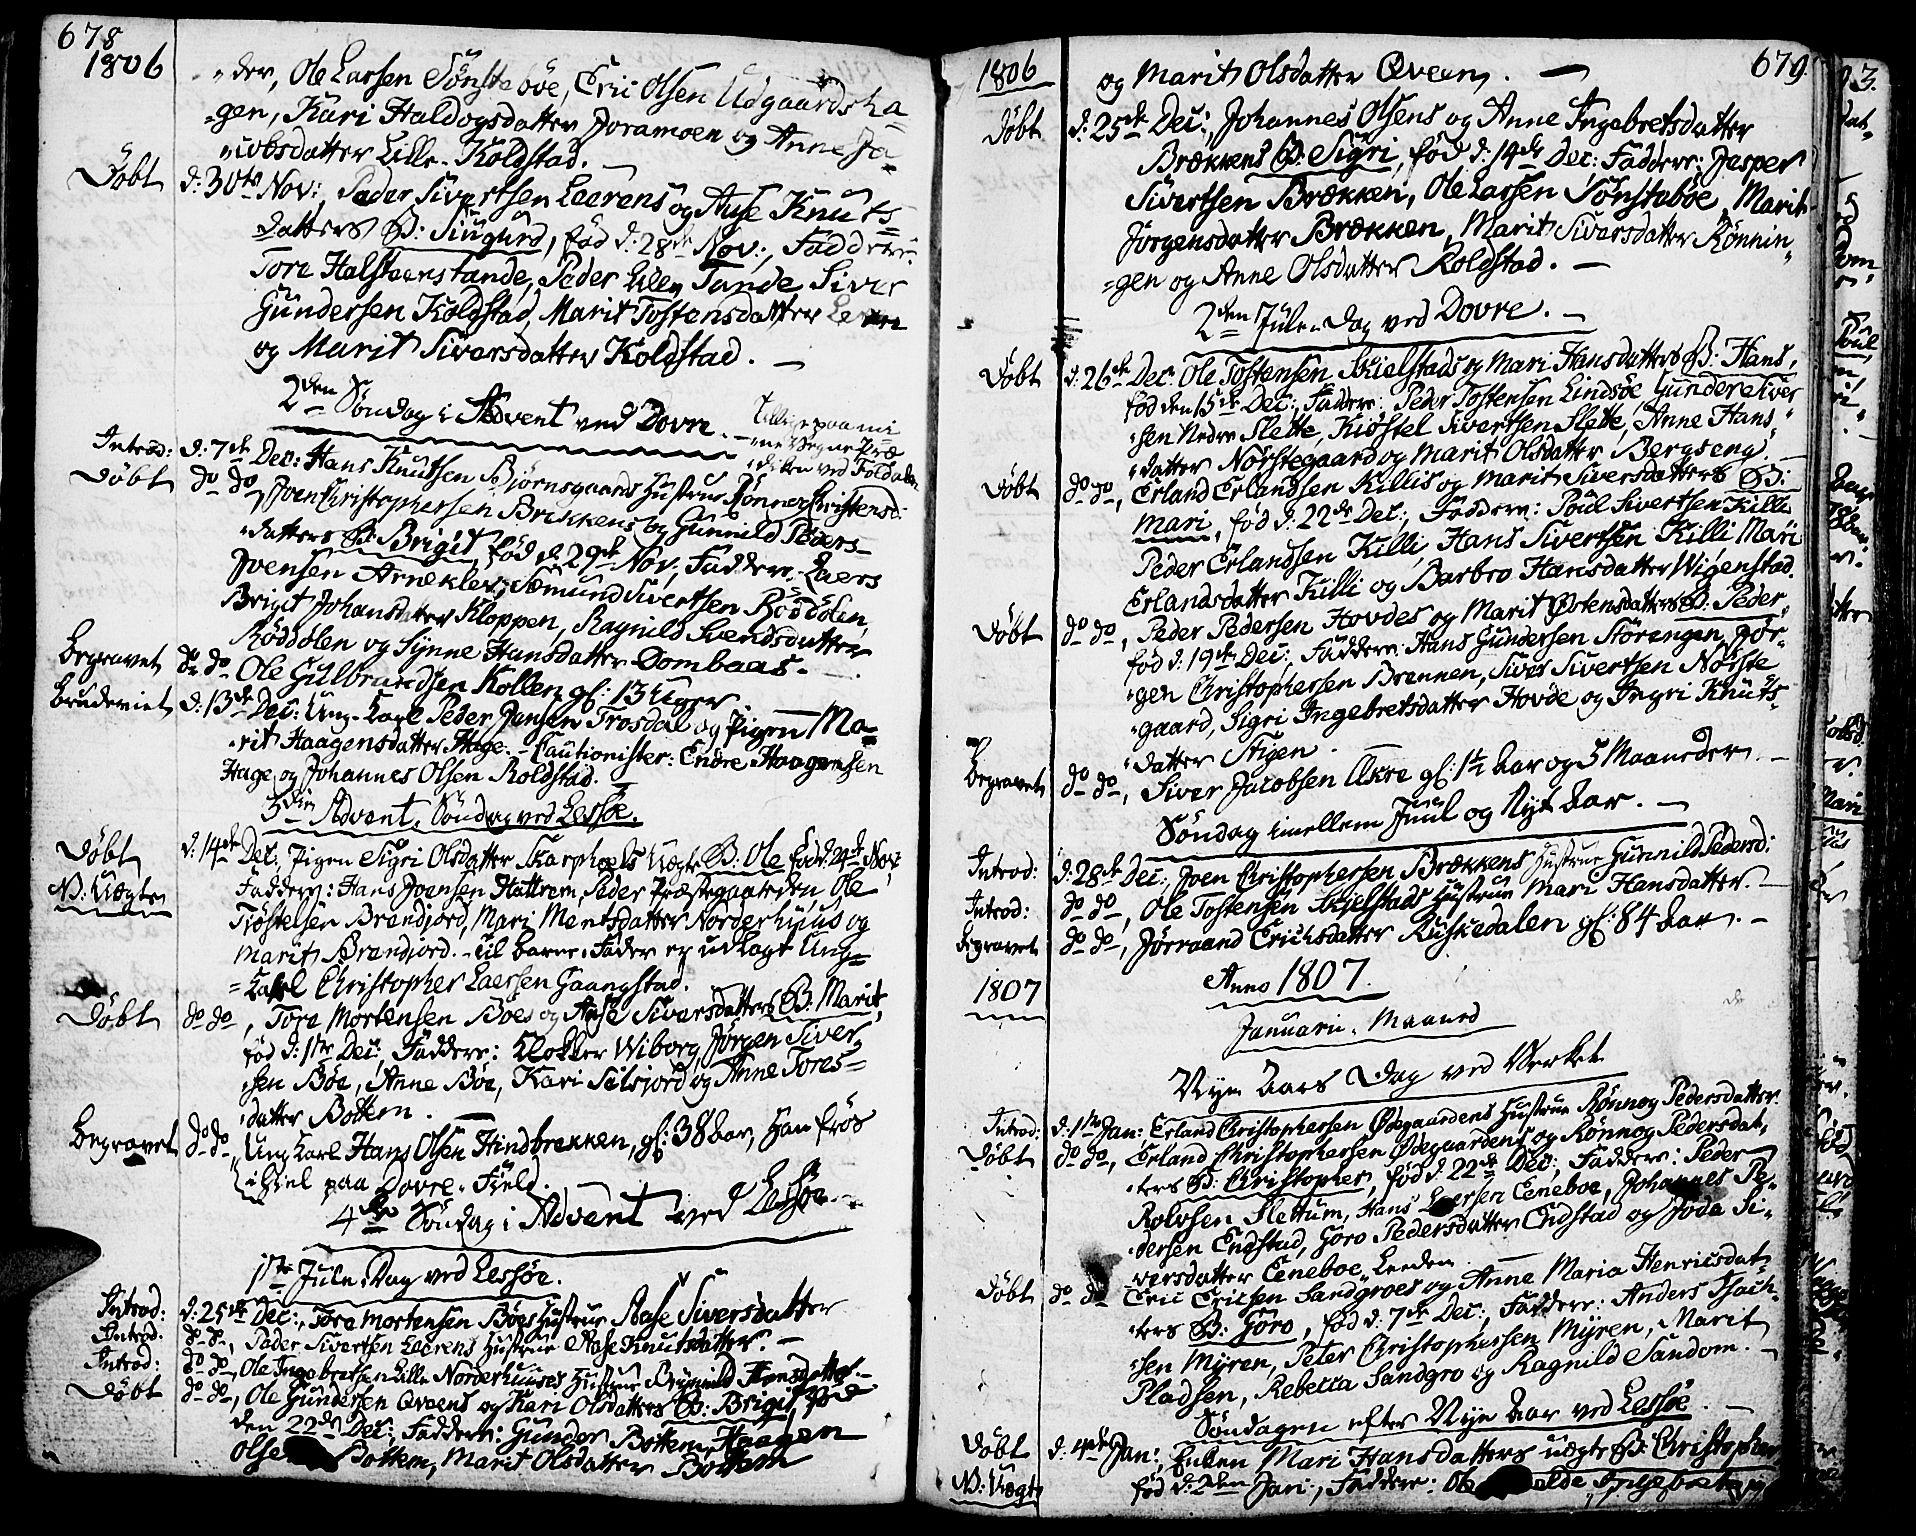 SAH, Lesja prestekontor, Ministerialbok nr. 3, 1777-1819, s. 678-679